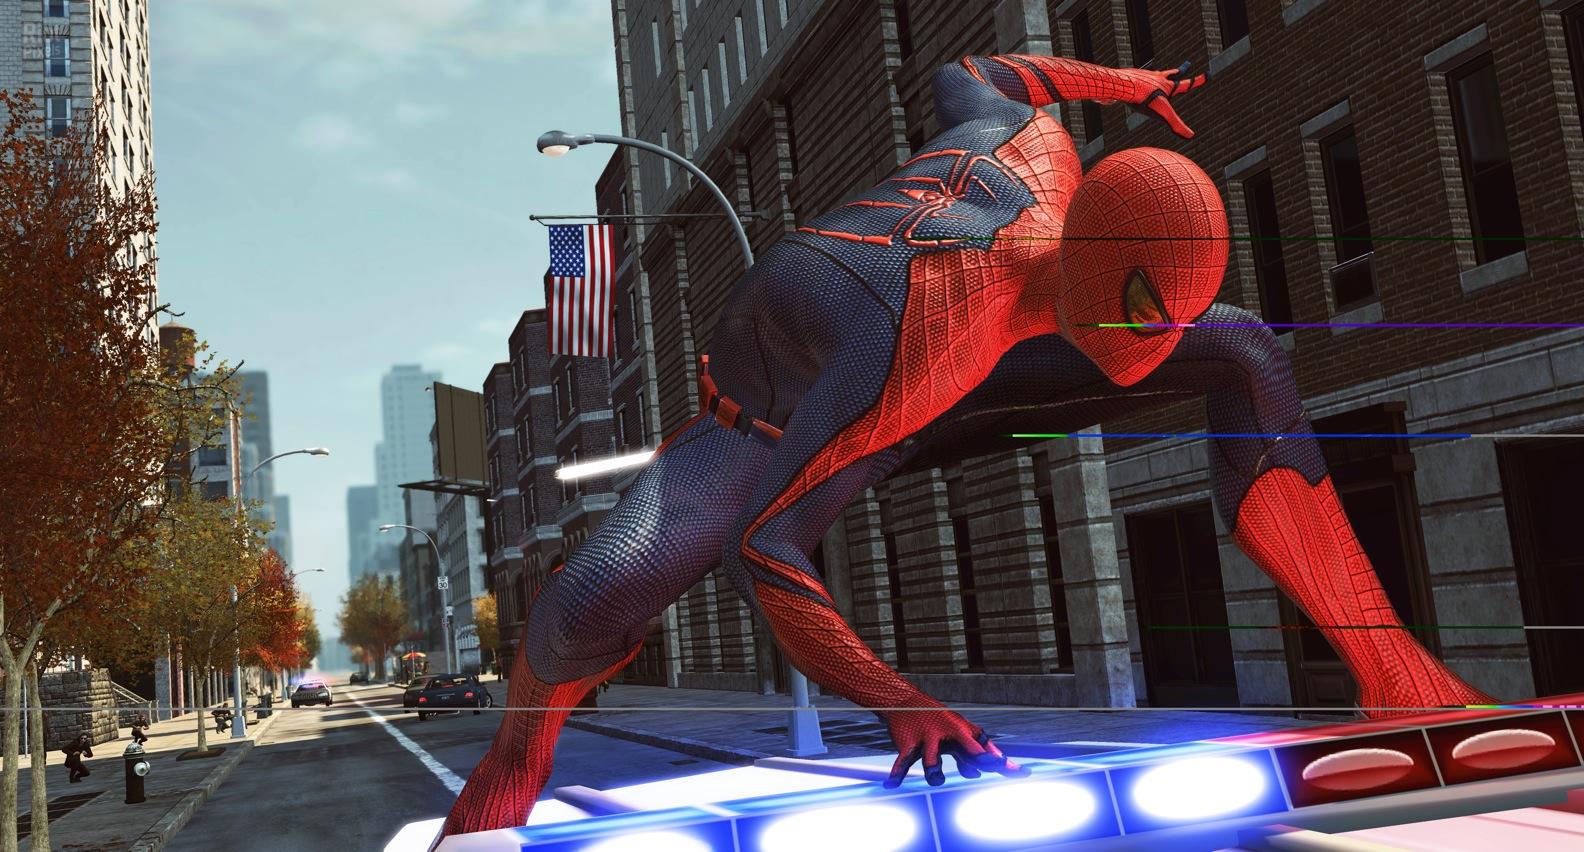 Spiderman giochi on line